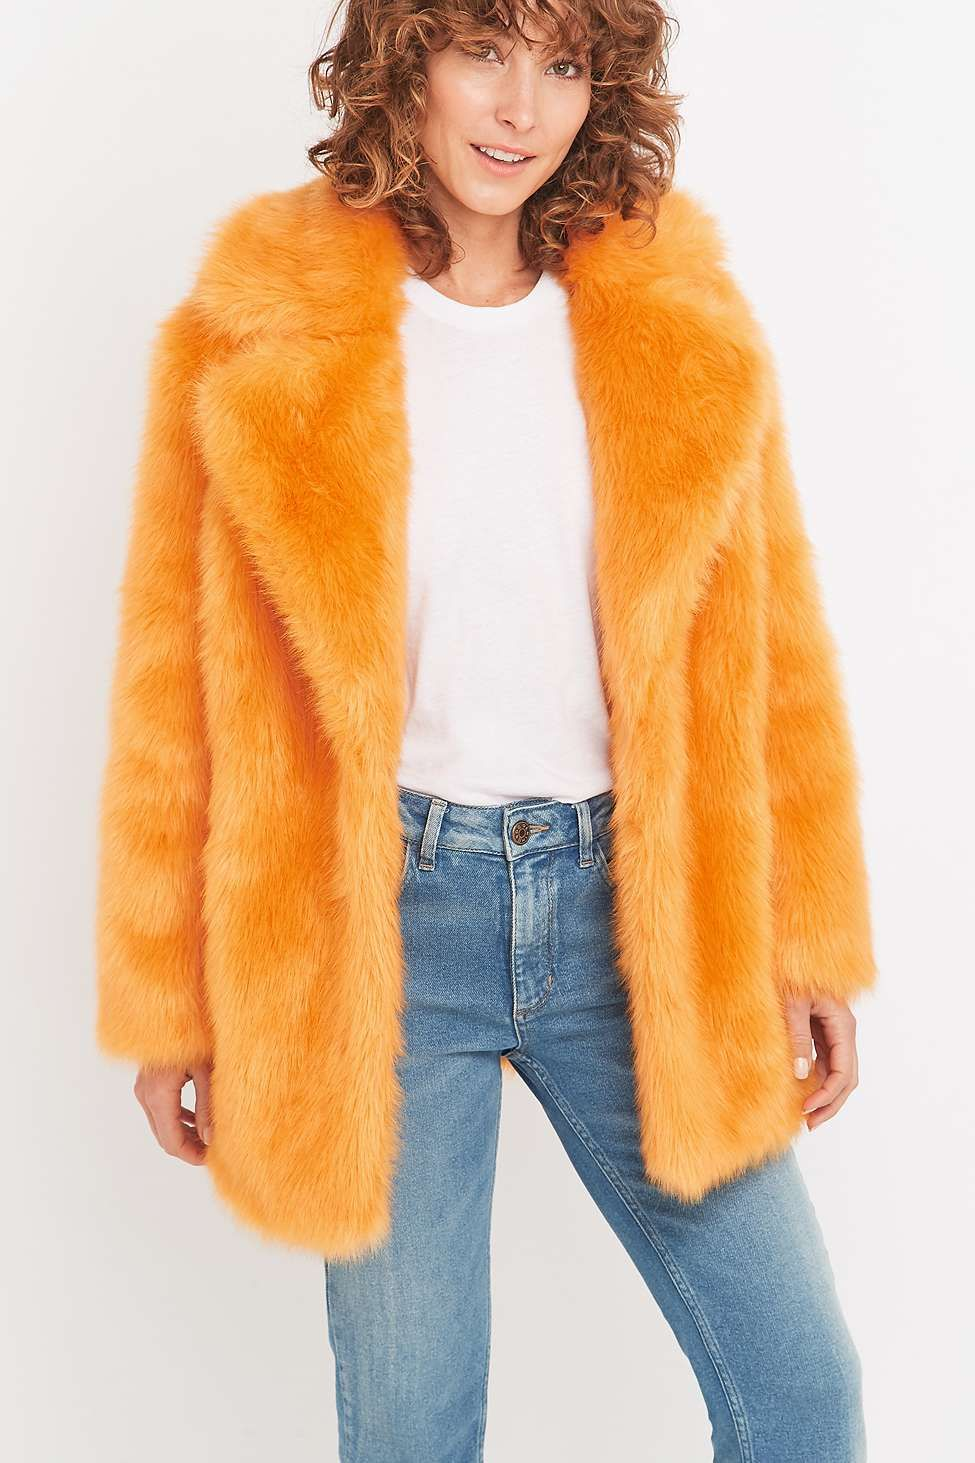 8f36c8e252 Jakke Heather Orange Faux-Fur Jacket | I'll Just Get My Wrap ...